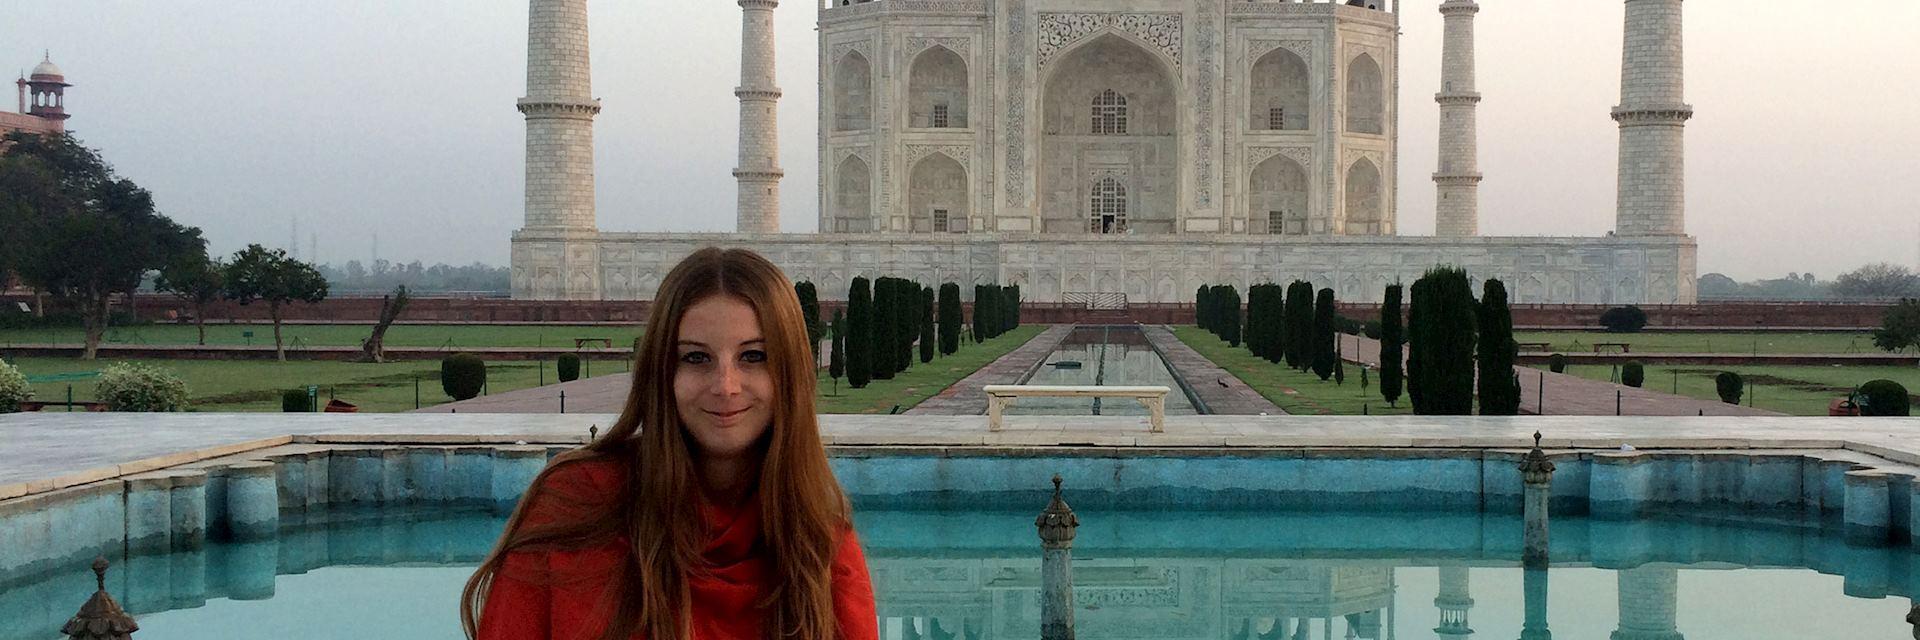 Alexandra visiting the Taj Mahal, India